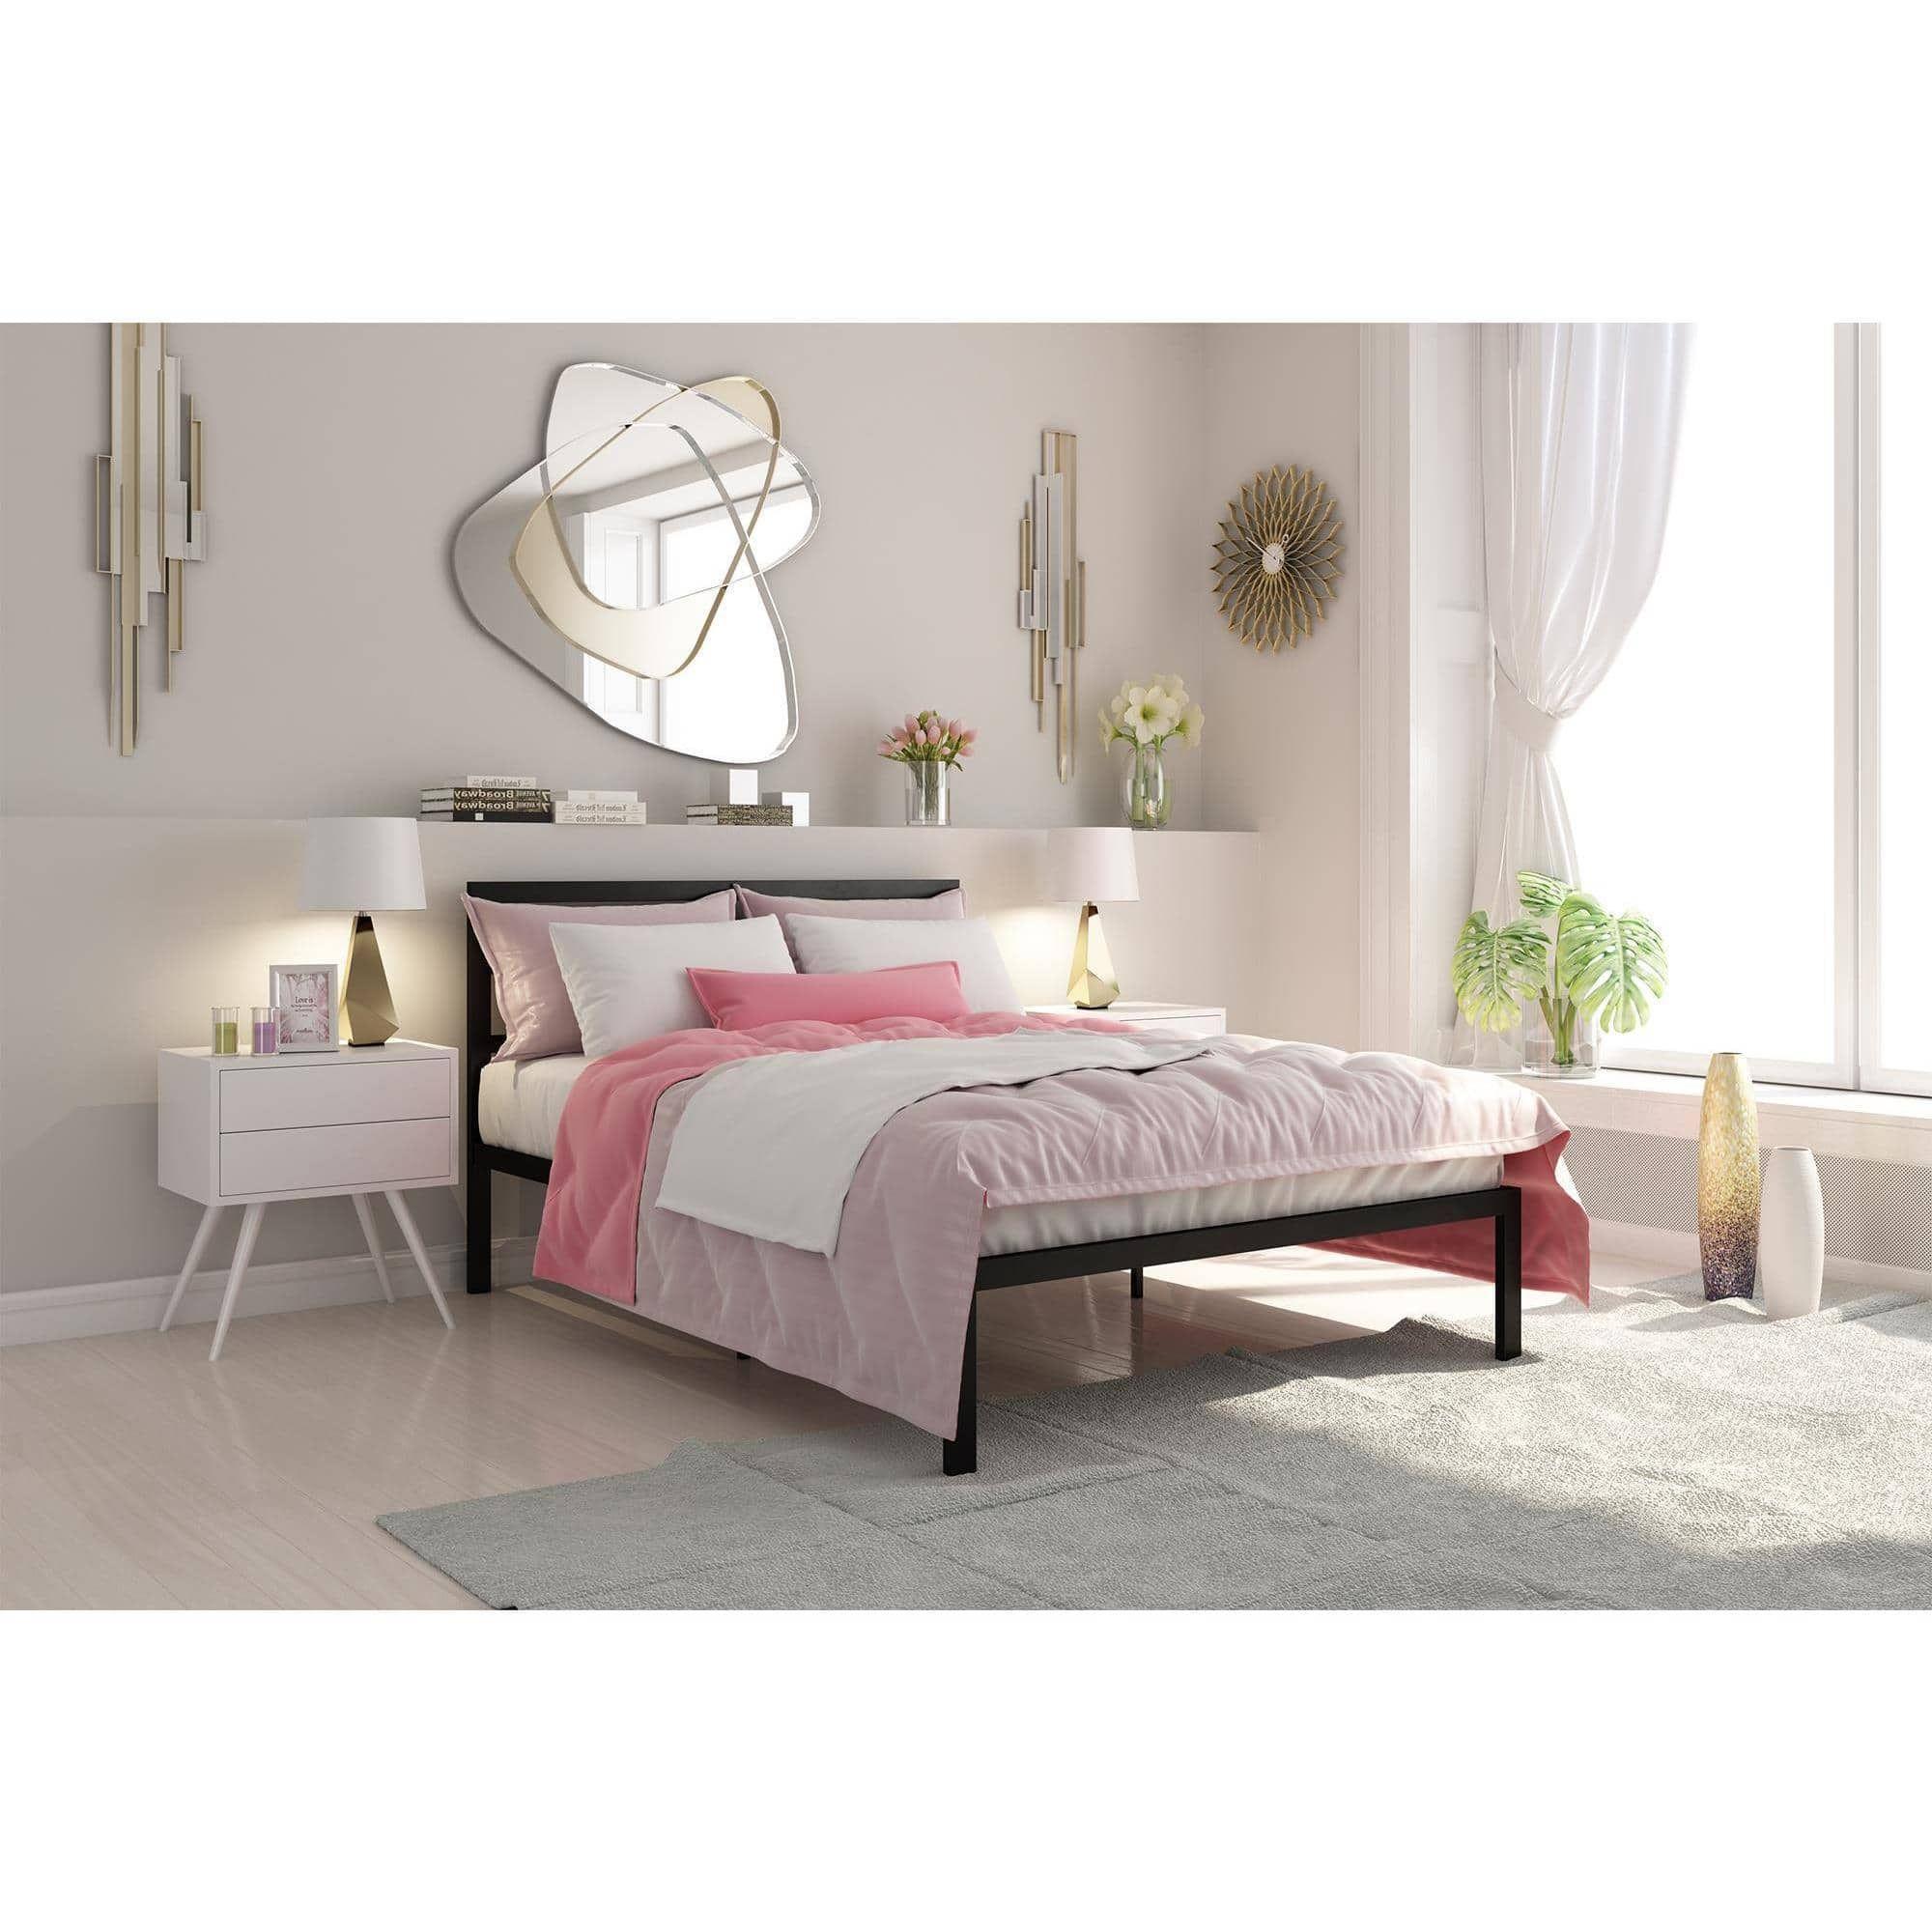 Signature Sleep Premium Modern Platform Bed With Headboard, Metal, Gold,